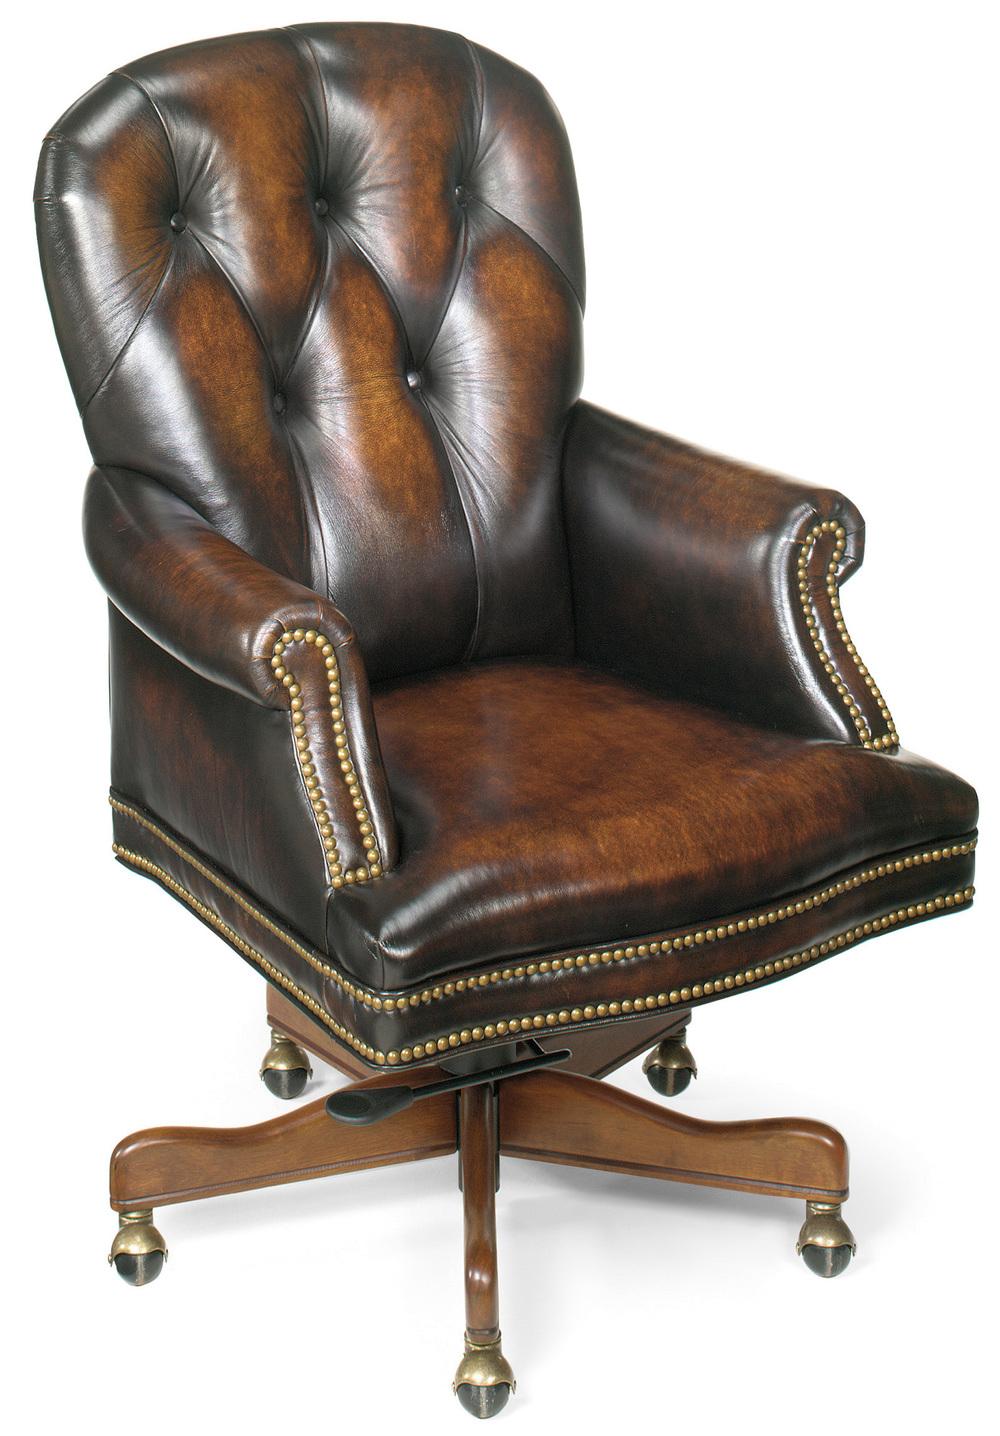 Hooker Furniture - Marcus Executive Swivel Tilt Chair